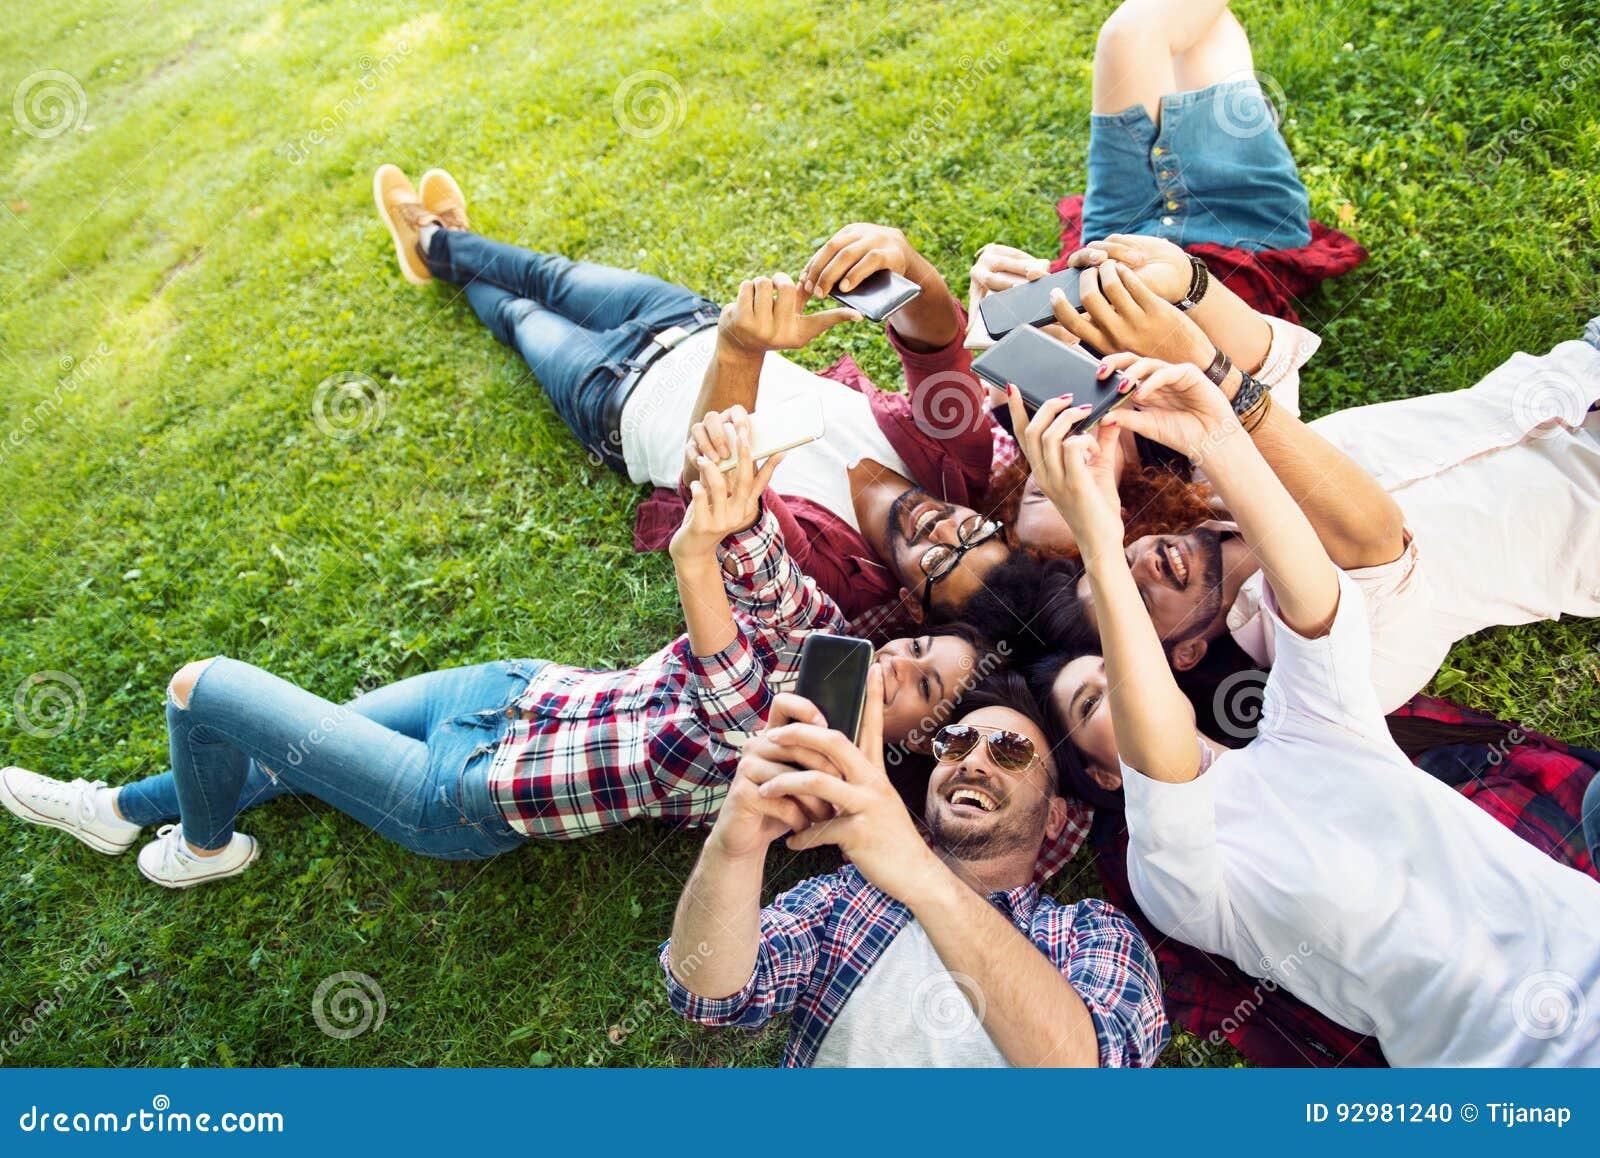 Groep jongeren die op het gras in cirkel, duimen leggen upGroup van jongeren die op het gras in cirkel leggen, die telefoons met